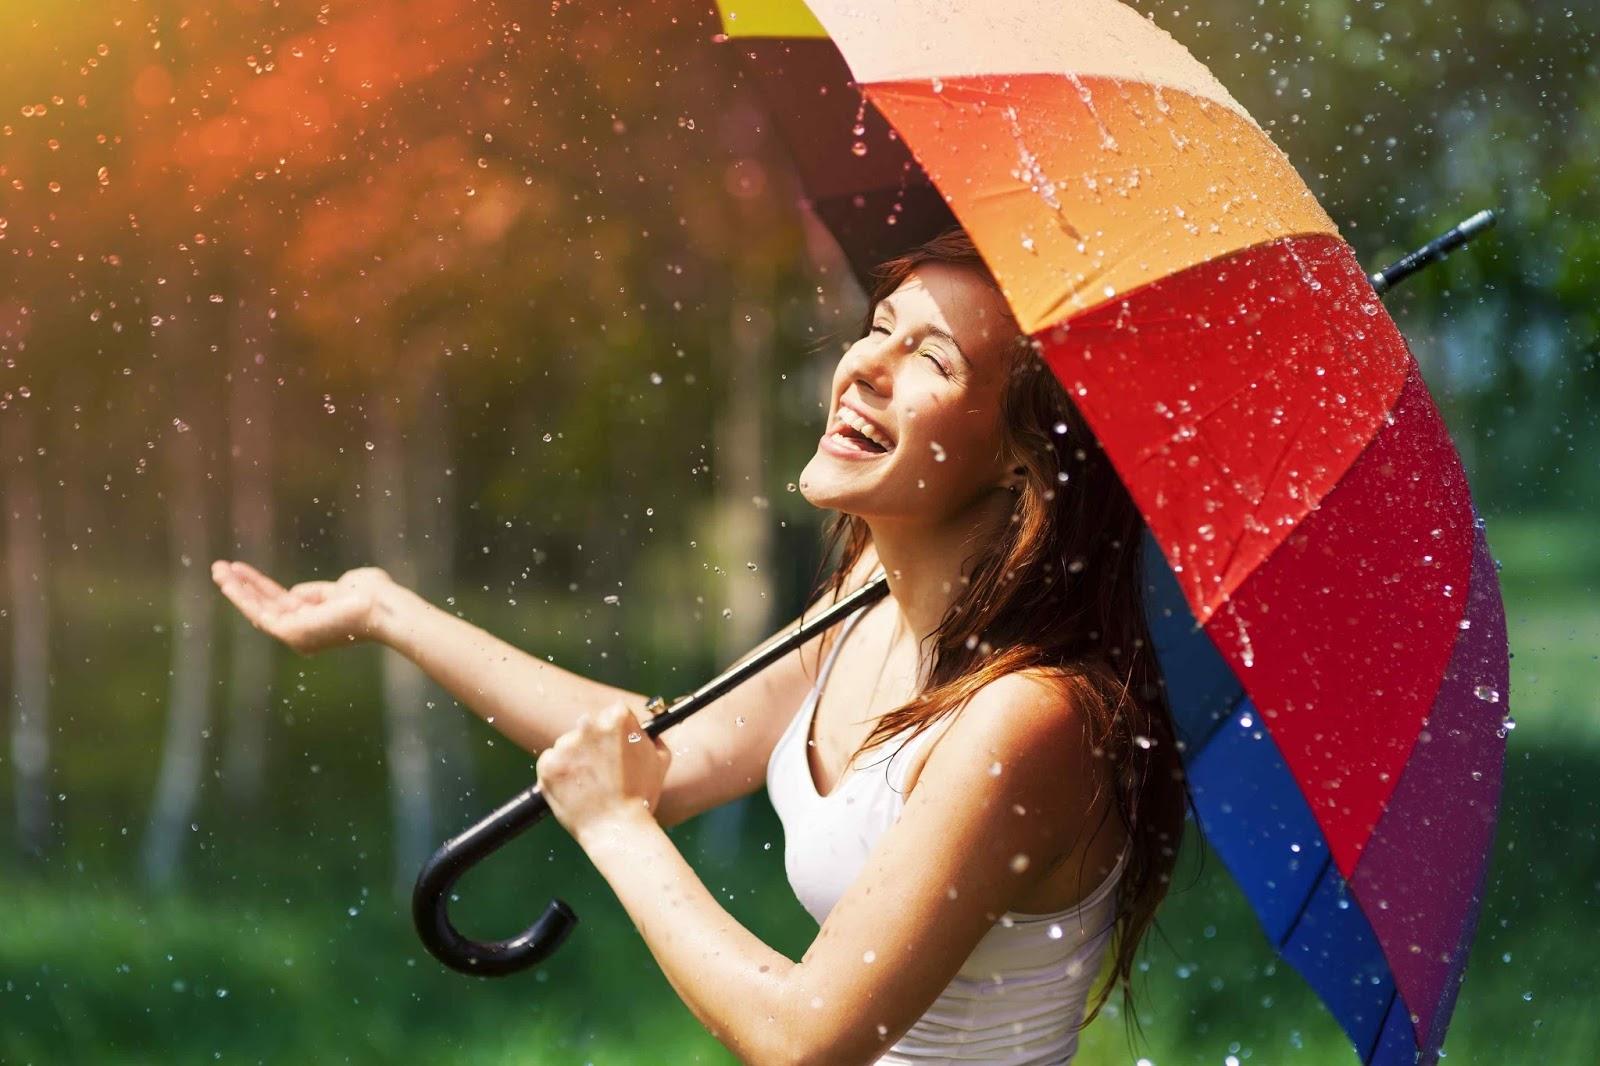 warm rain enjoying girl profile dp for whatsapp